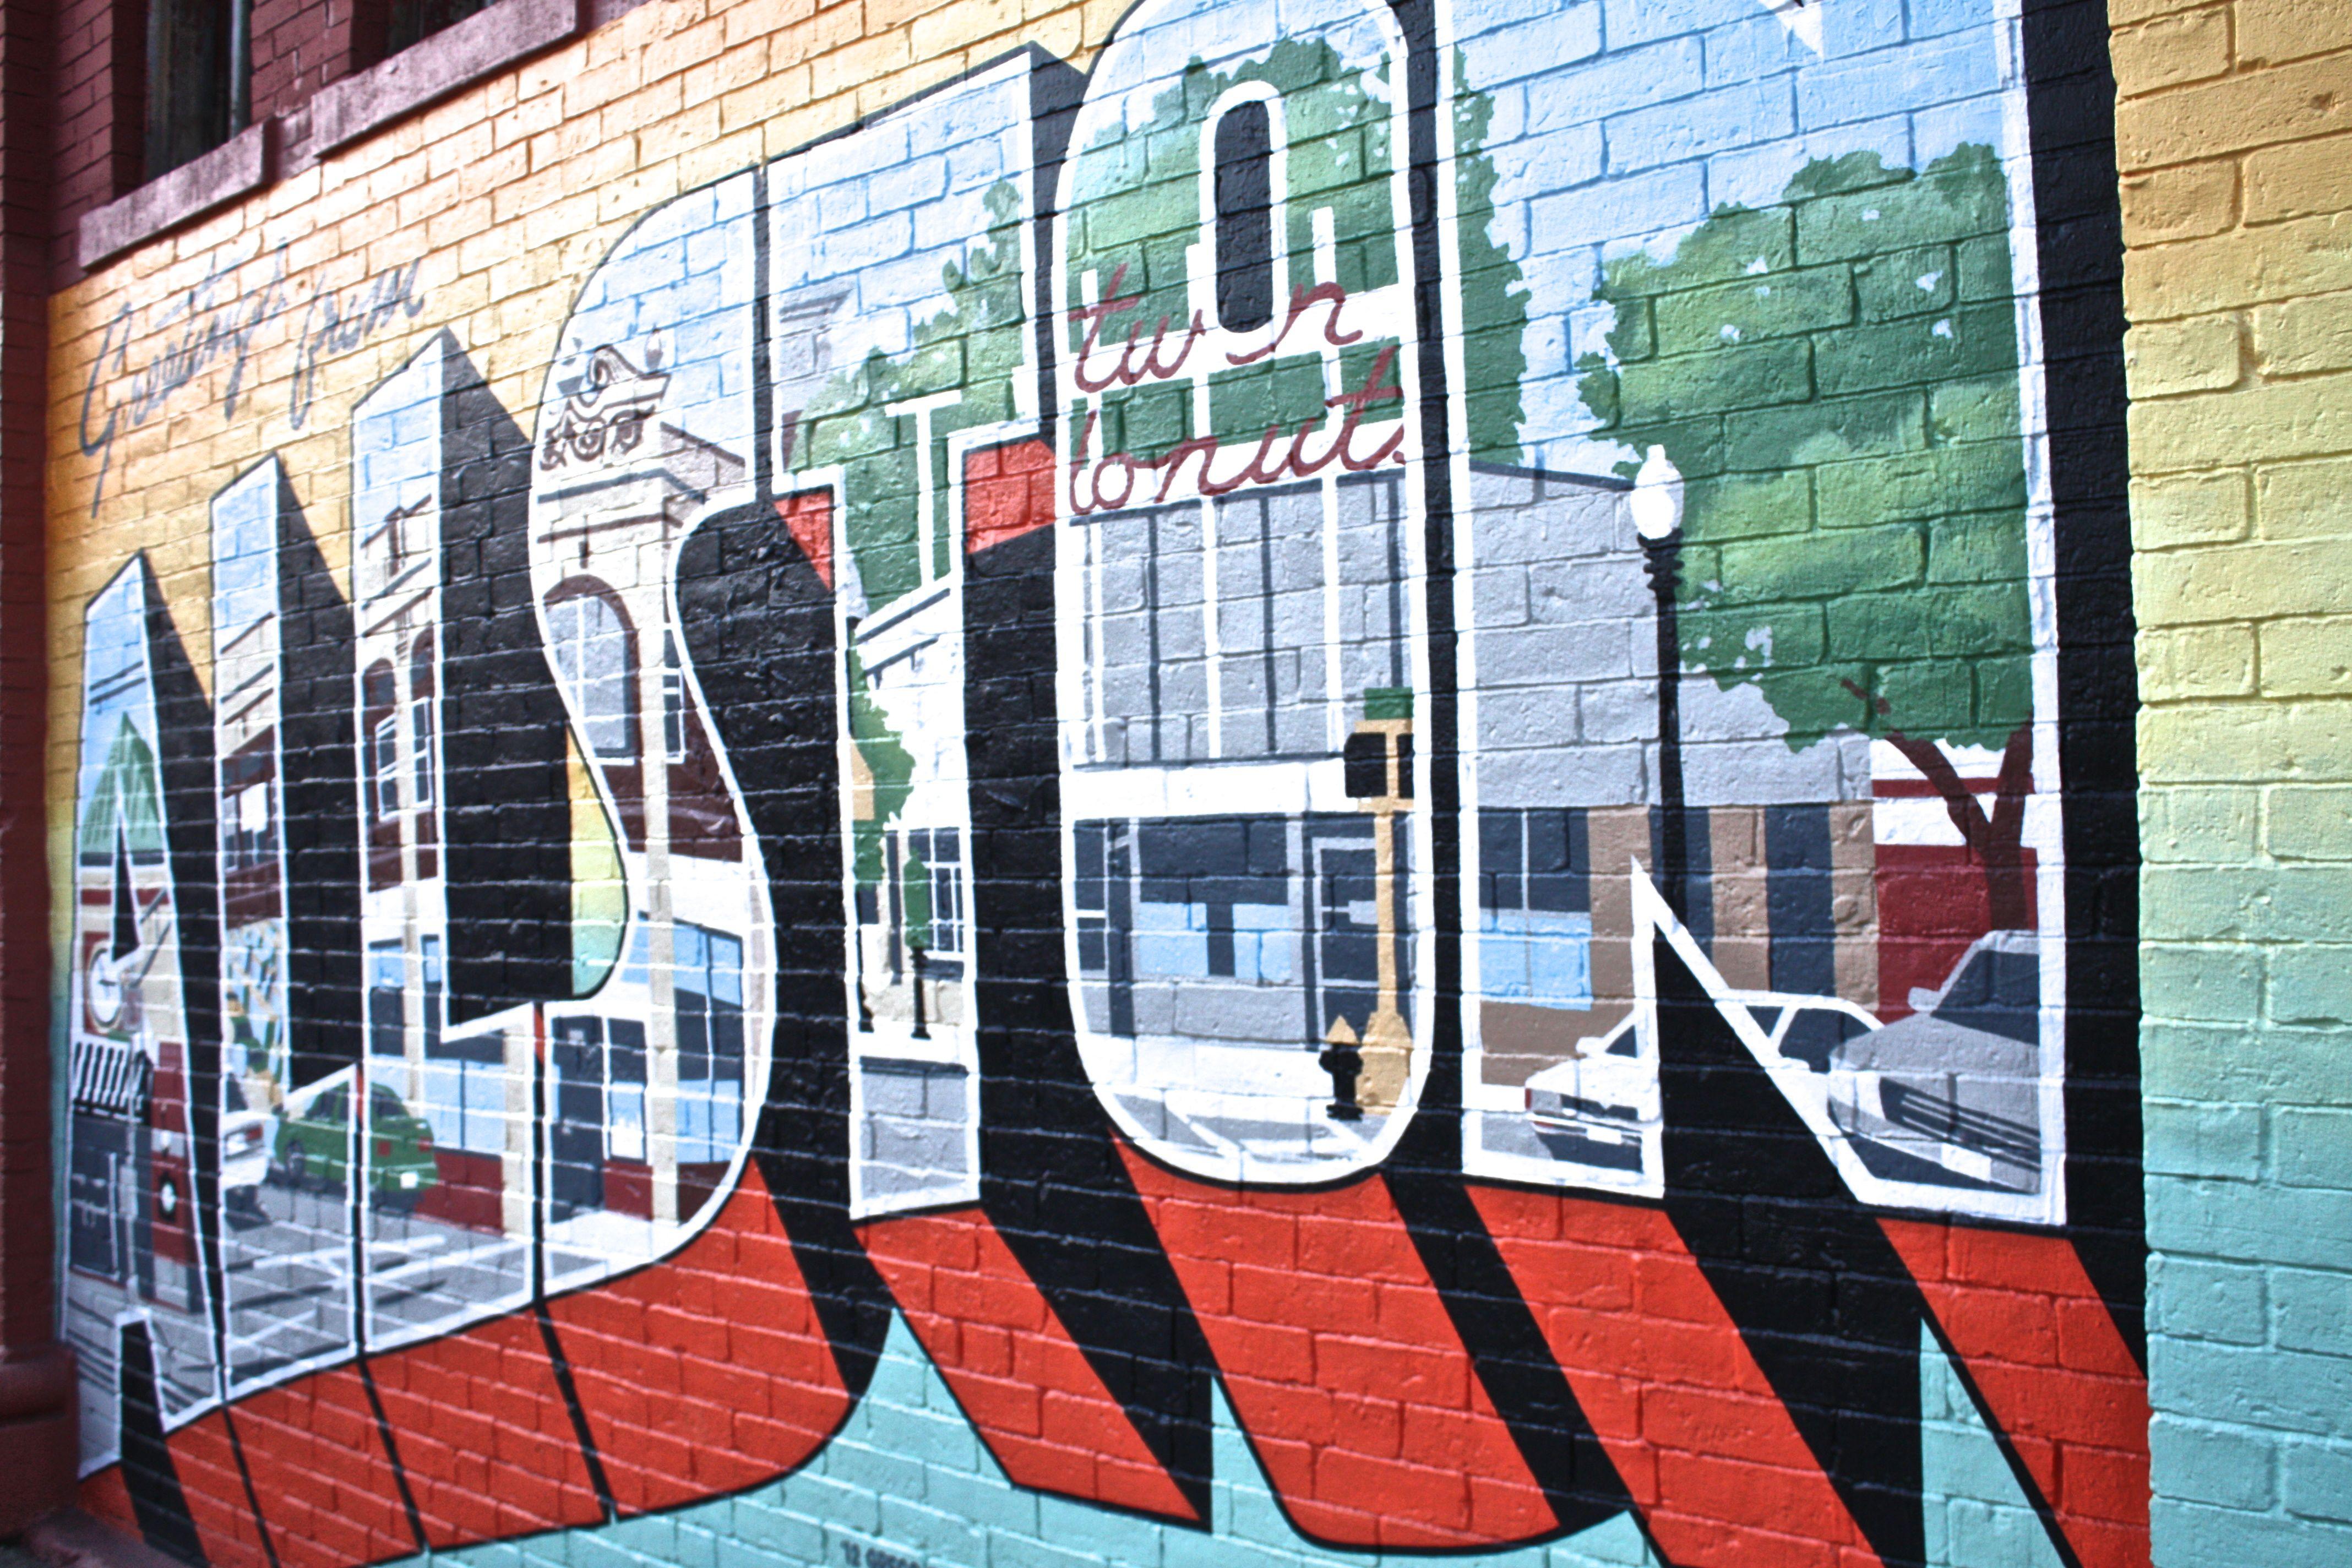 Art-ston: The Many Murals of Allston | BOSTON HASSLE